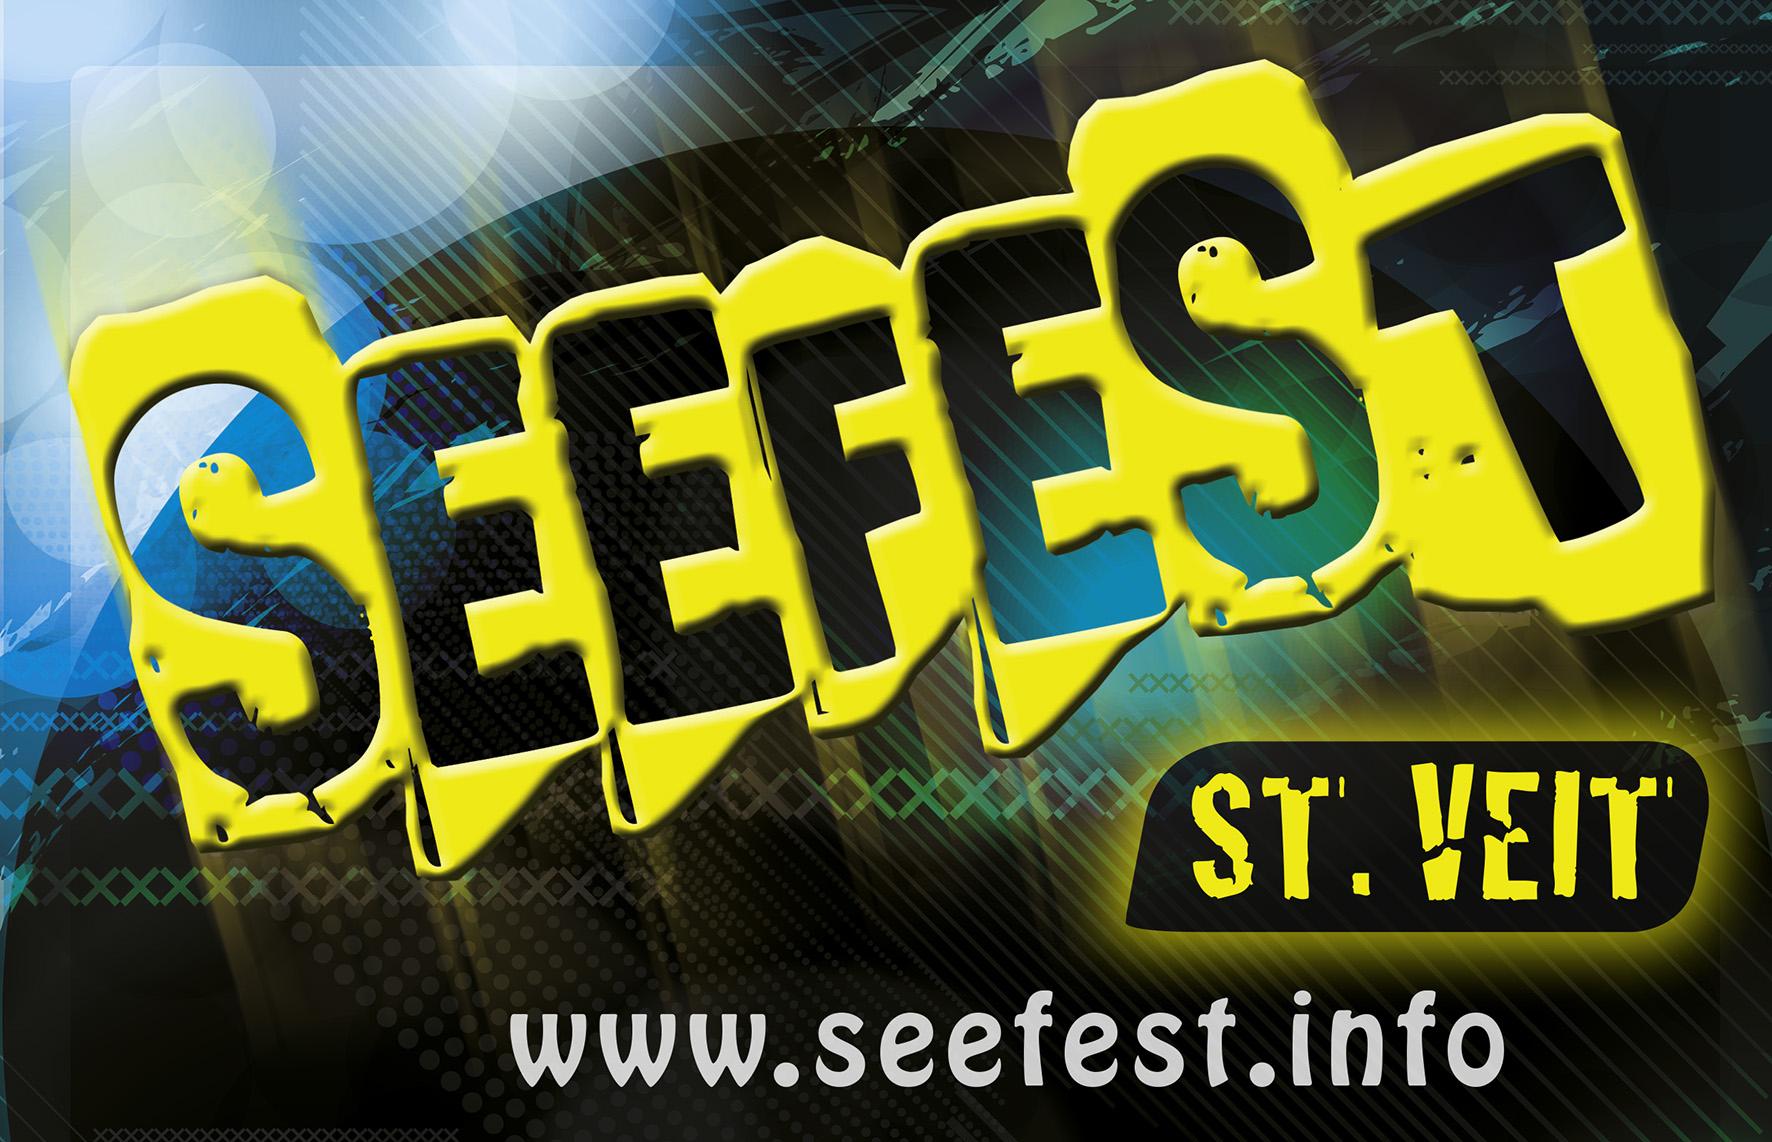 Seefest St. Veit